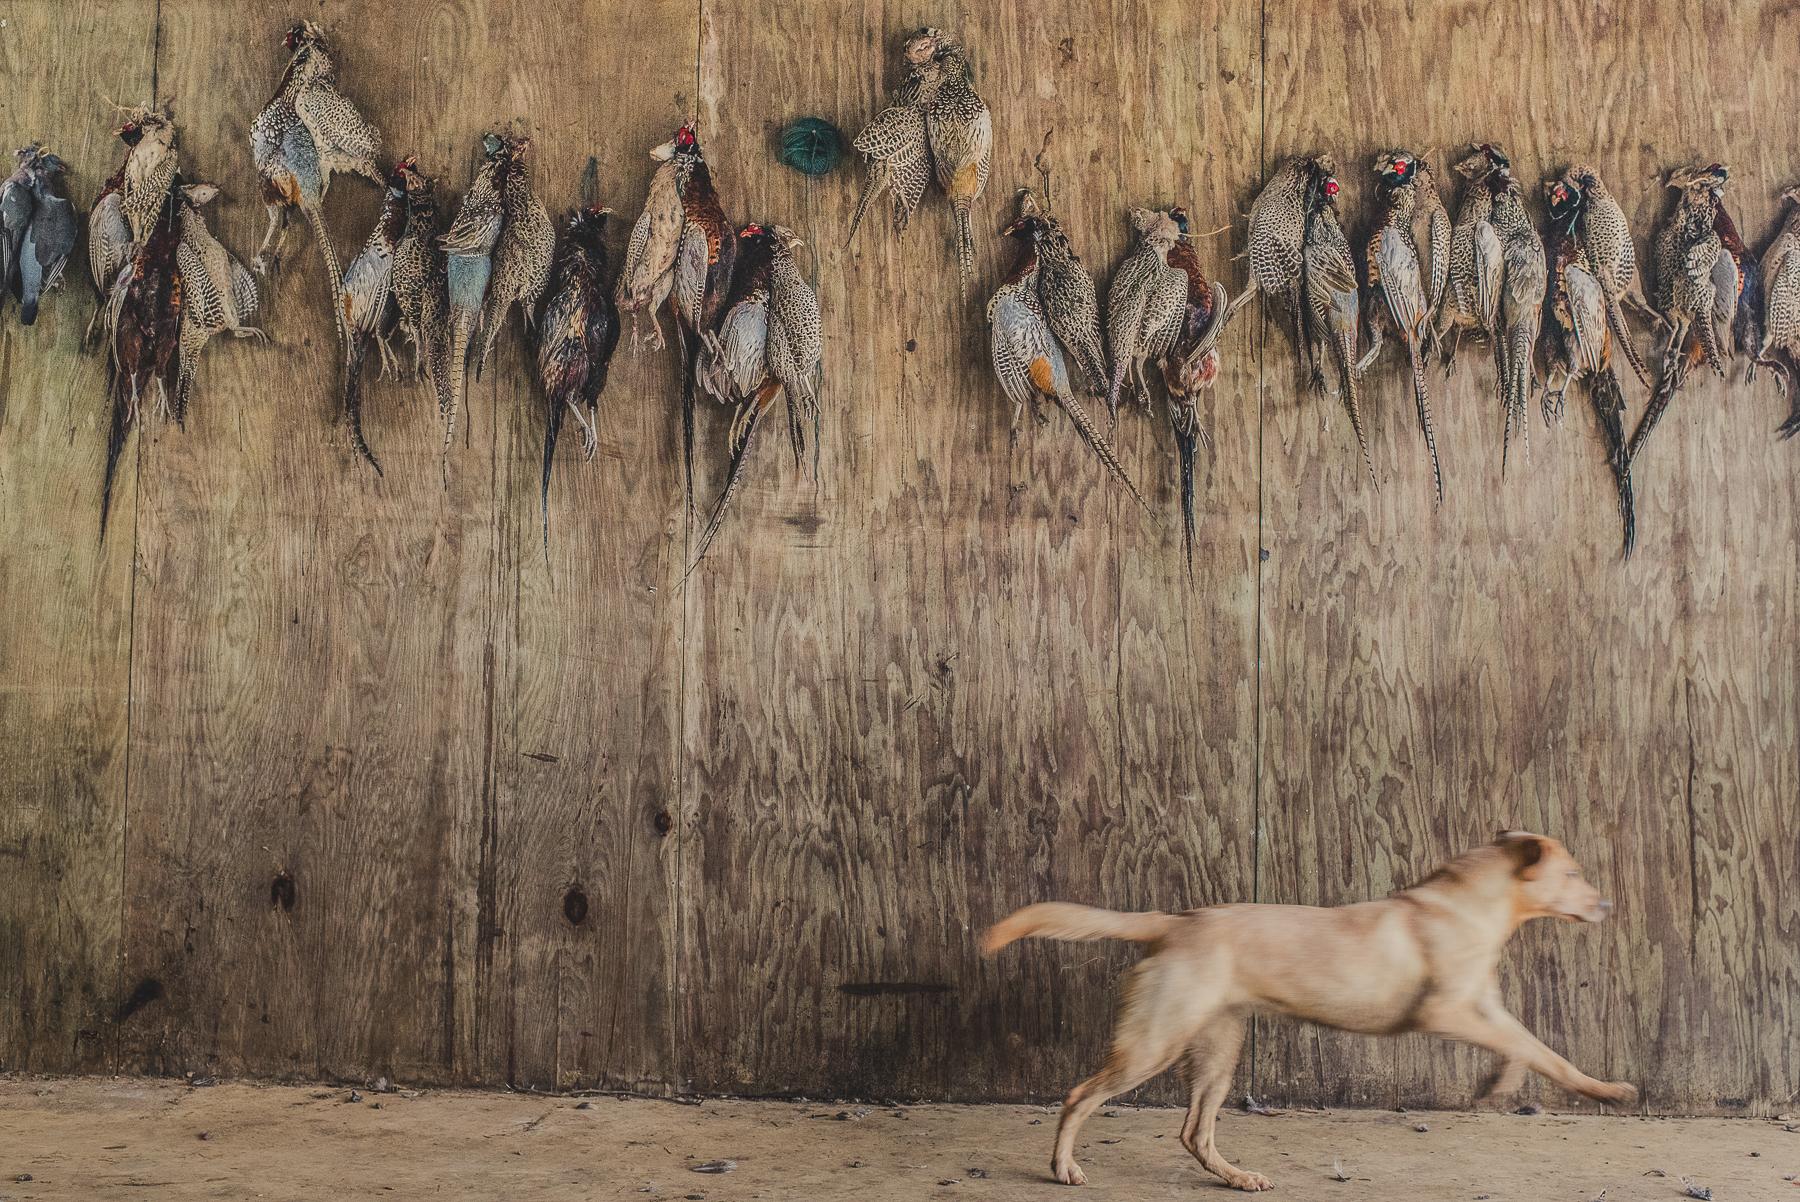 Yellow labrador running past pheasants